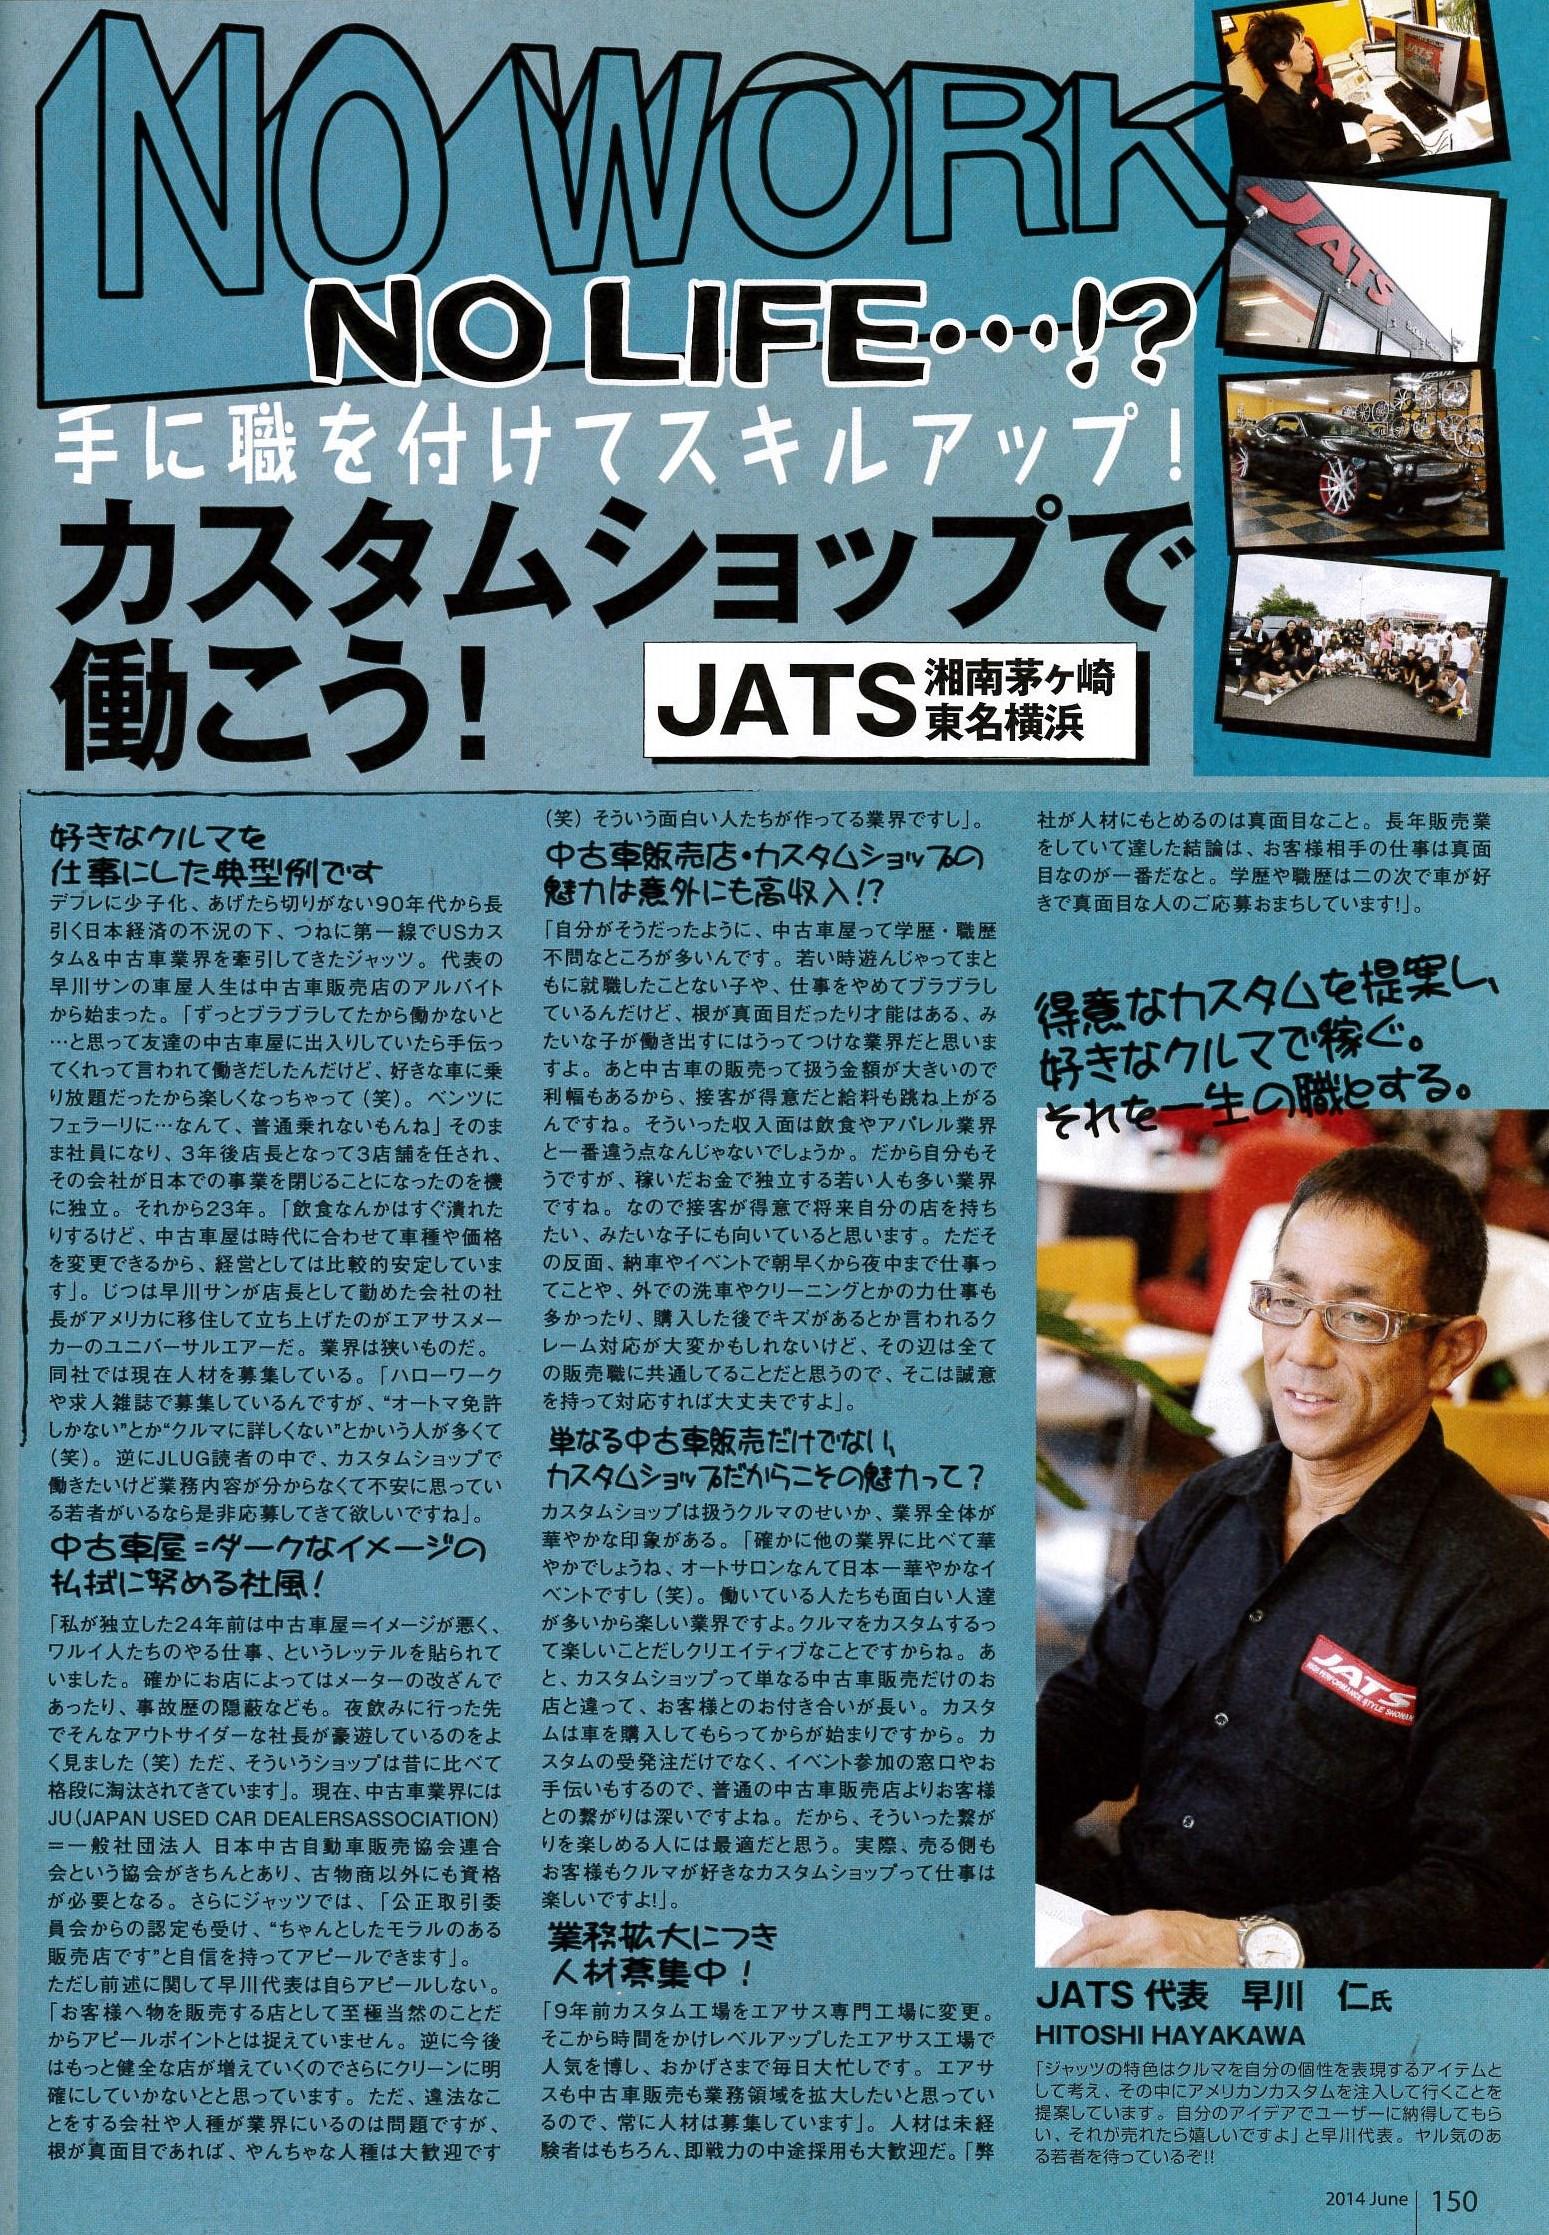 honsya@/jats.co.jp_20140425_161330_001